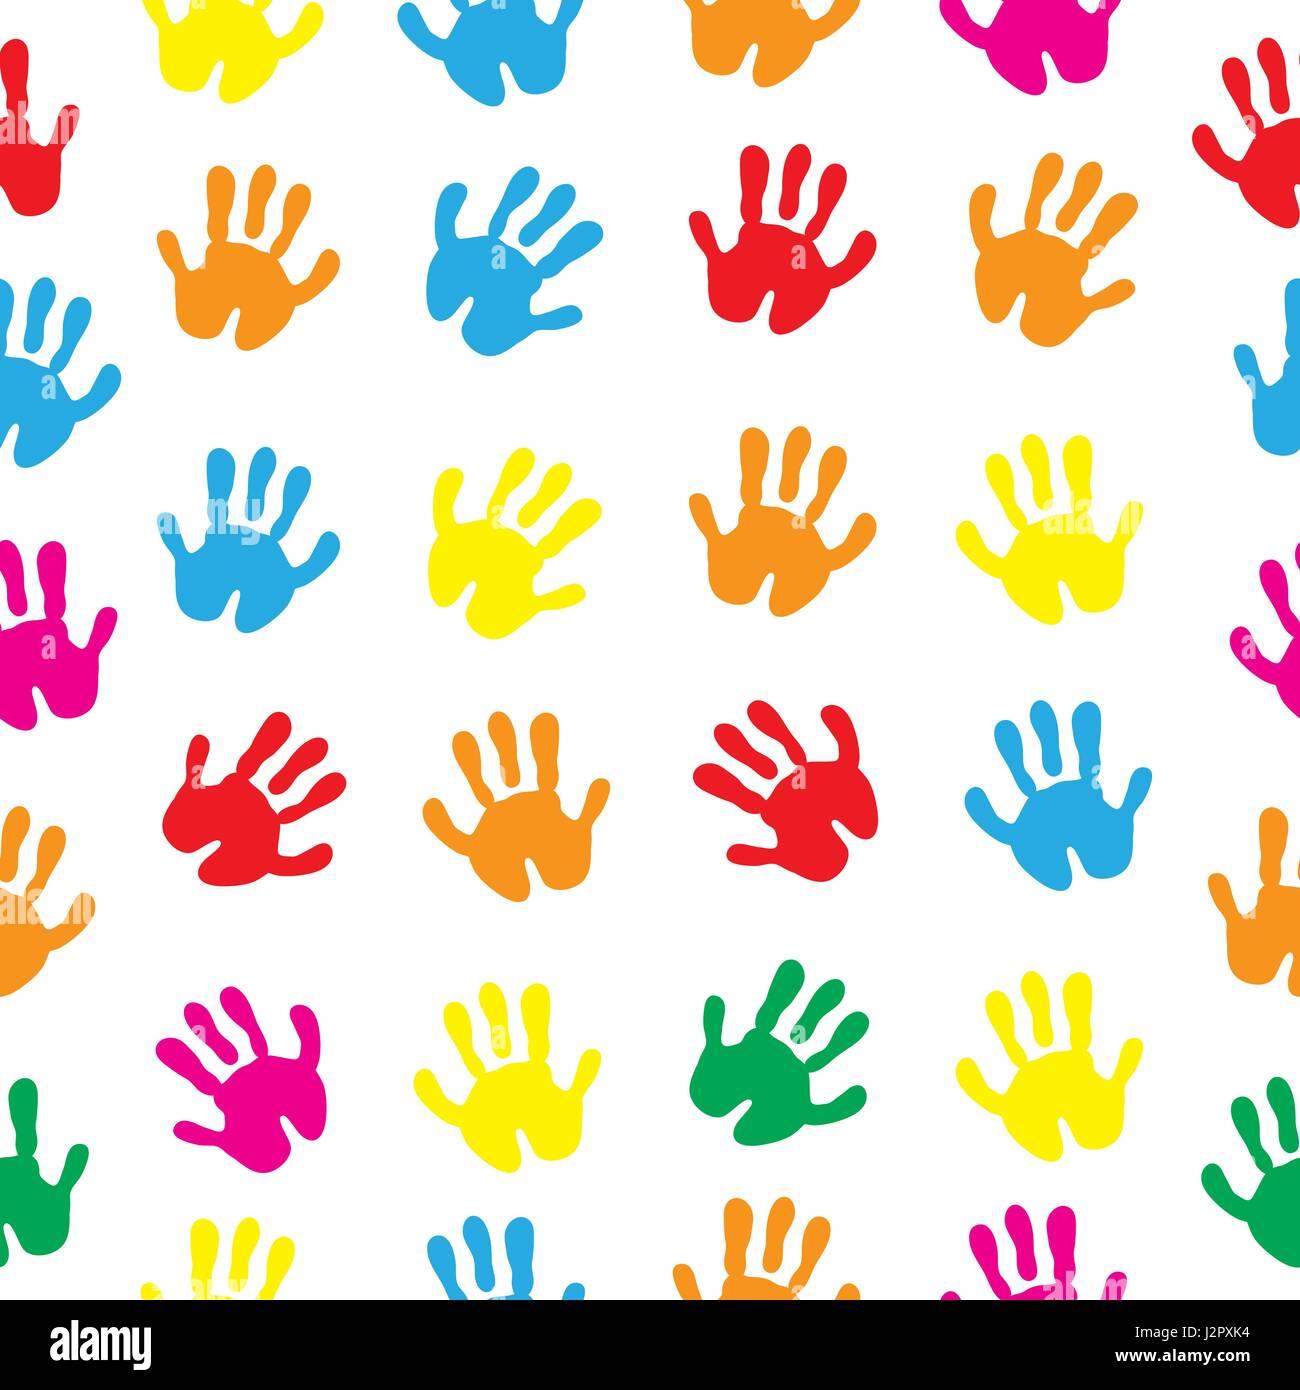 Children s hands, hand prints seamless texture. Children s palms background wallpaper. Vector illustration. - Stock Vector